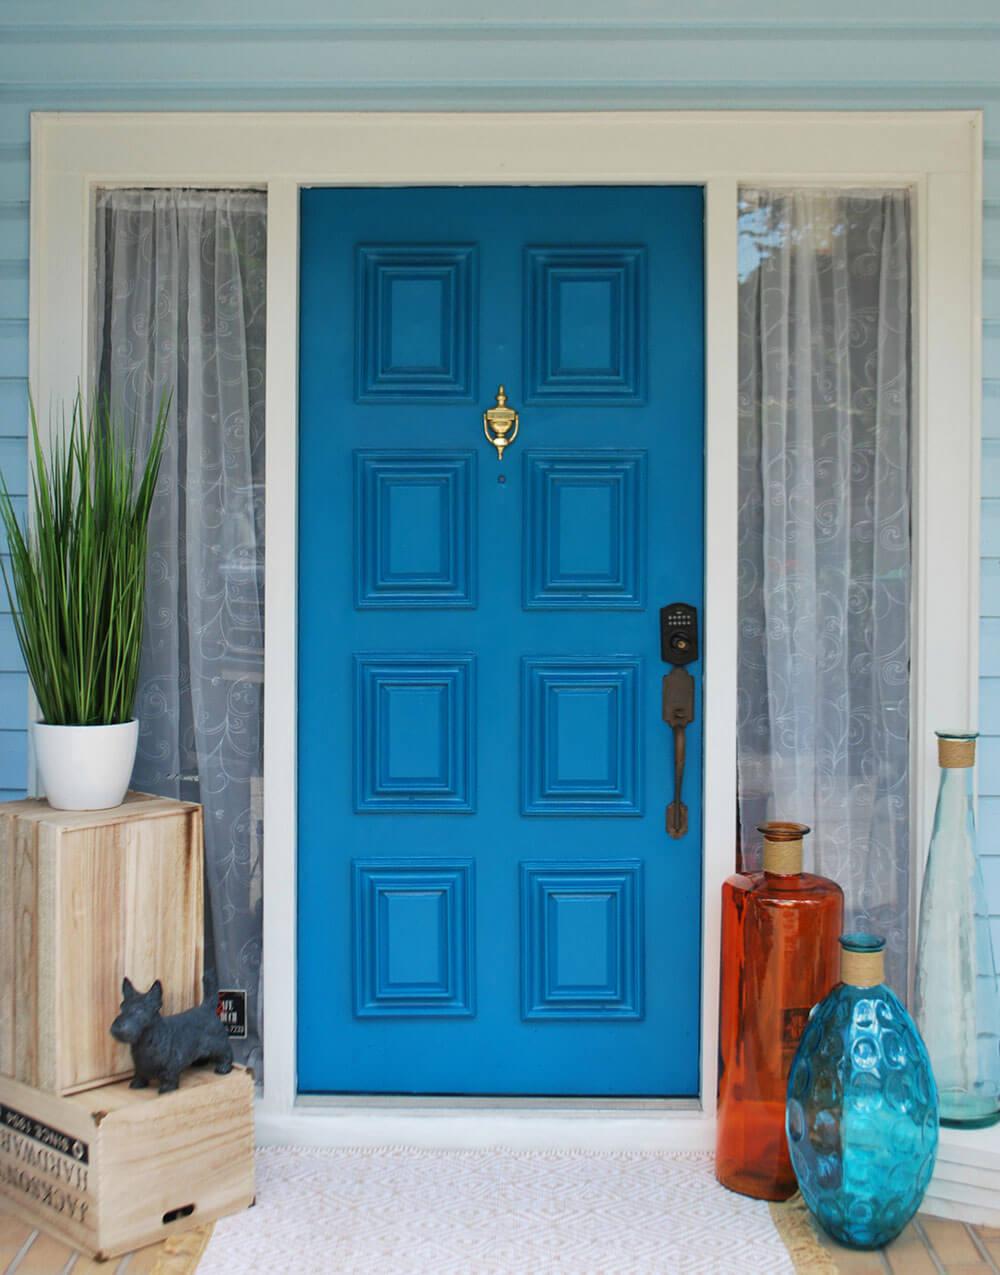 30 Best Front Door Color Ideas and Designs for 2020 on Door Color Ideas  id=73112